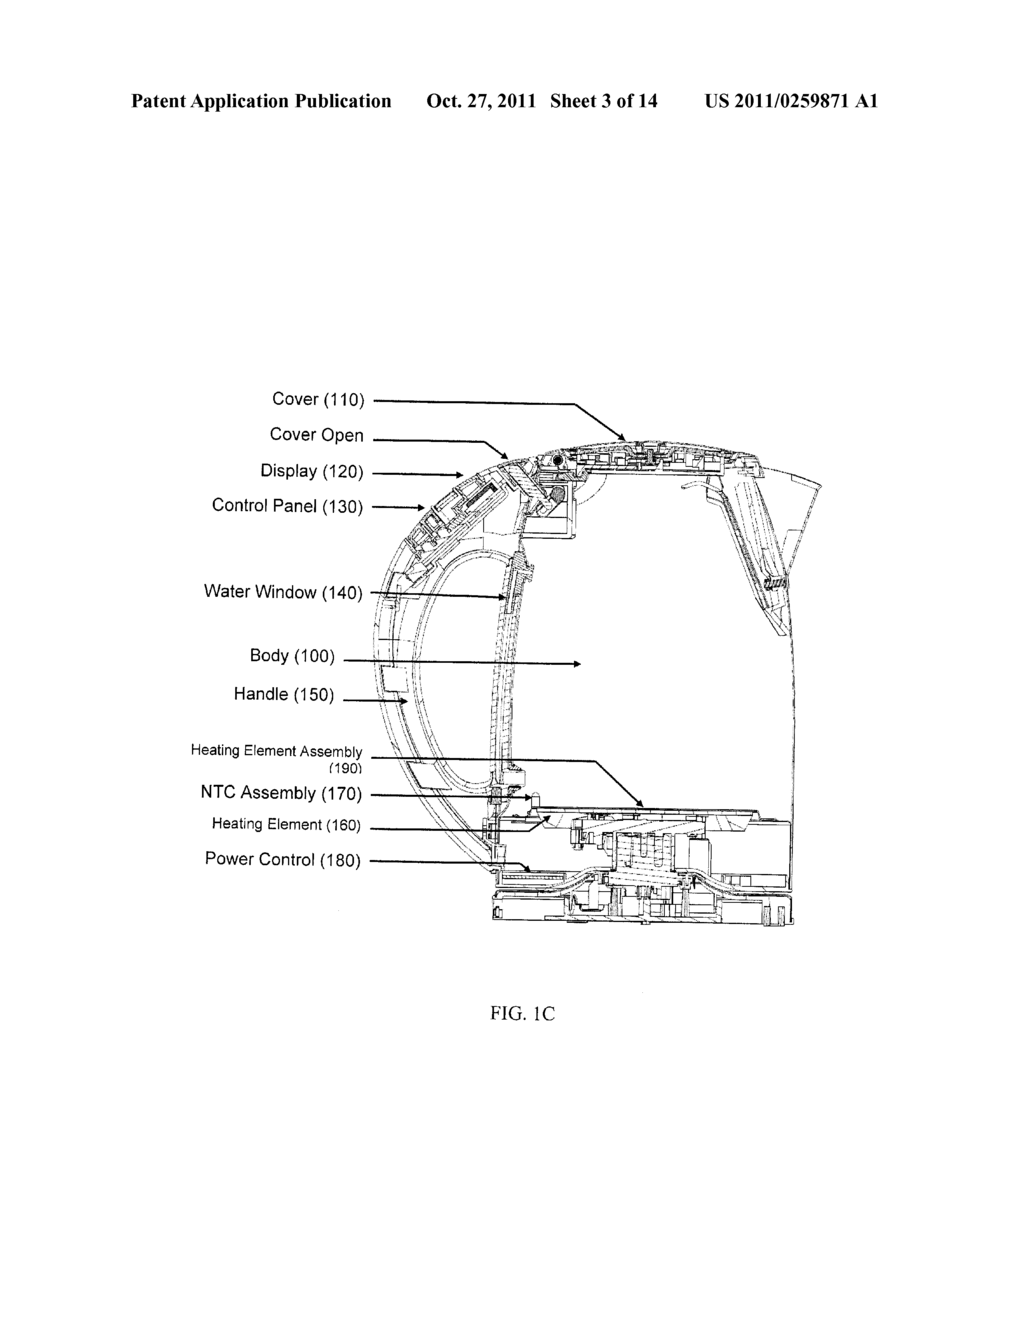 am transmitter circuit diagram electric kettle: electric kettle diagram circuit diagram kettle #14